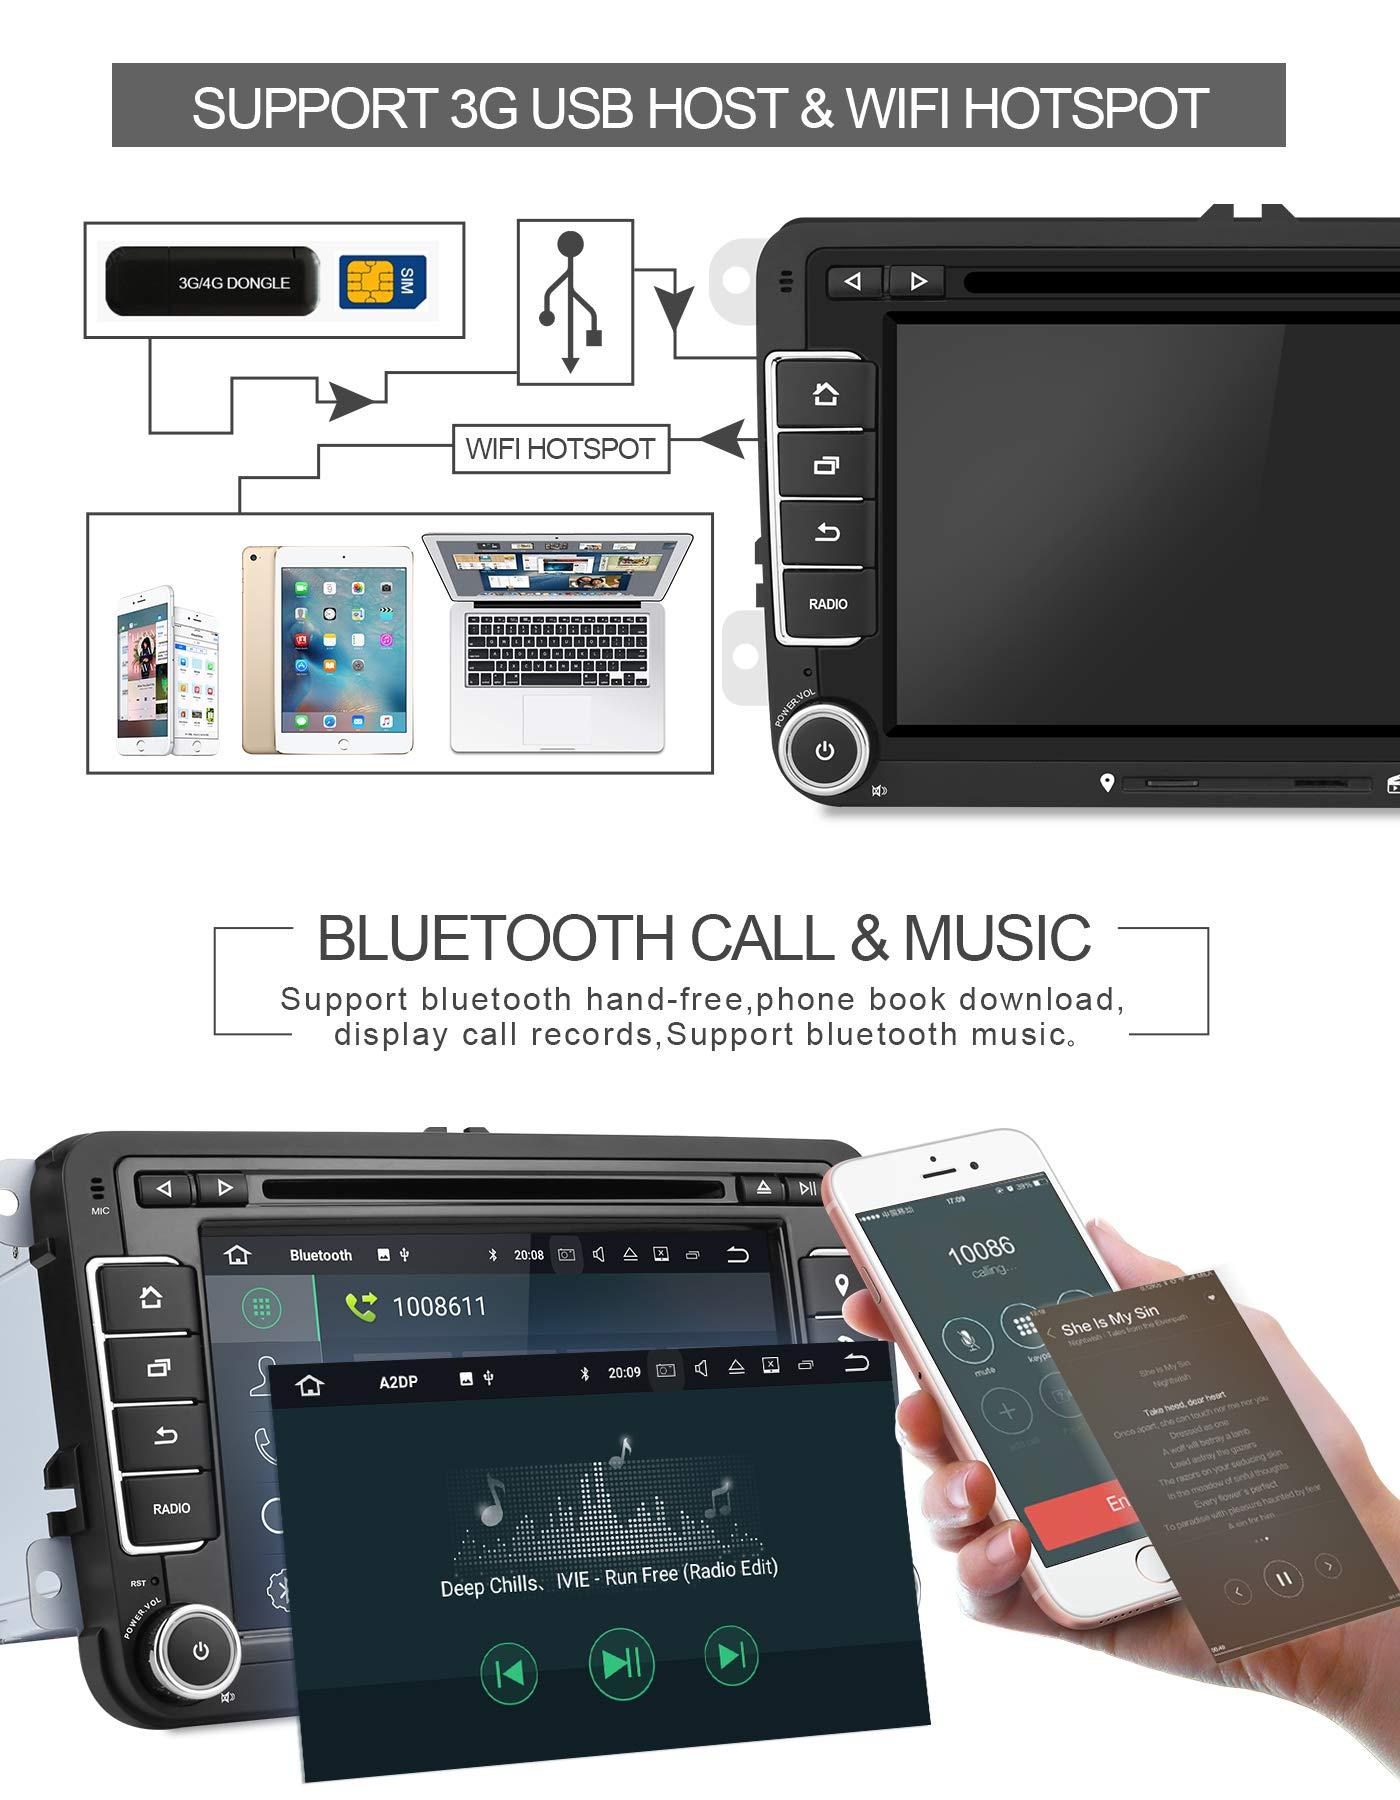 Aumume-7-Zoll-Android-90-Autoradio-fr-VW-Golf-Passat-Polo-Tiguan-Jetta-Skoda-Fabia-Yeti-Seat-mit-Navi-Untersttzt-Mirrorlink-Carplay-Bluetooth-DAB-mit-16-GB-Karte